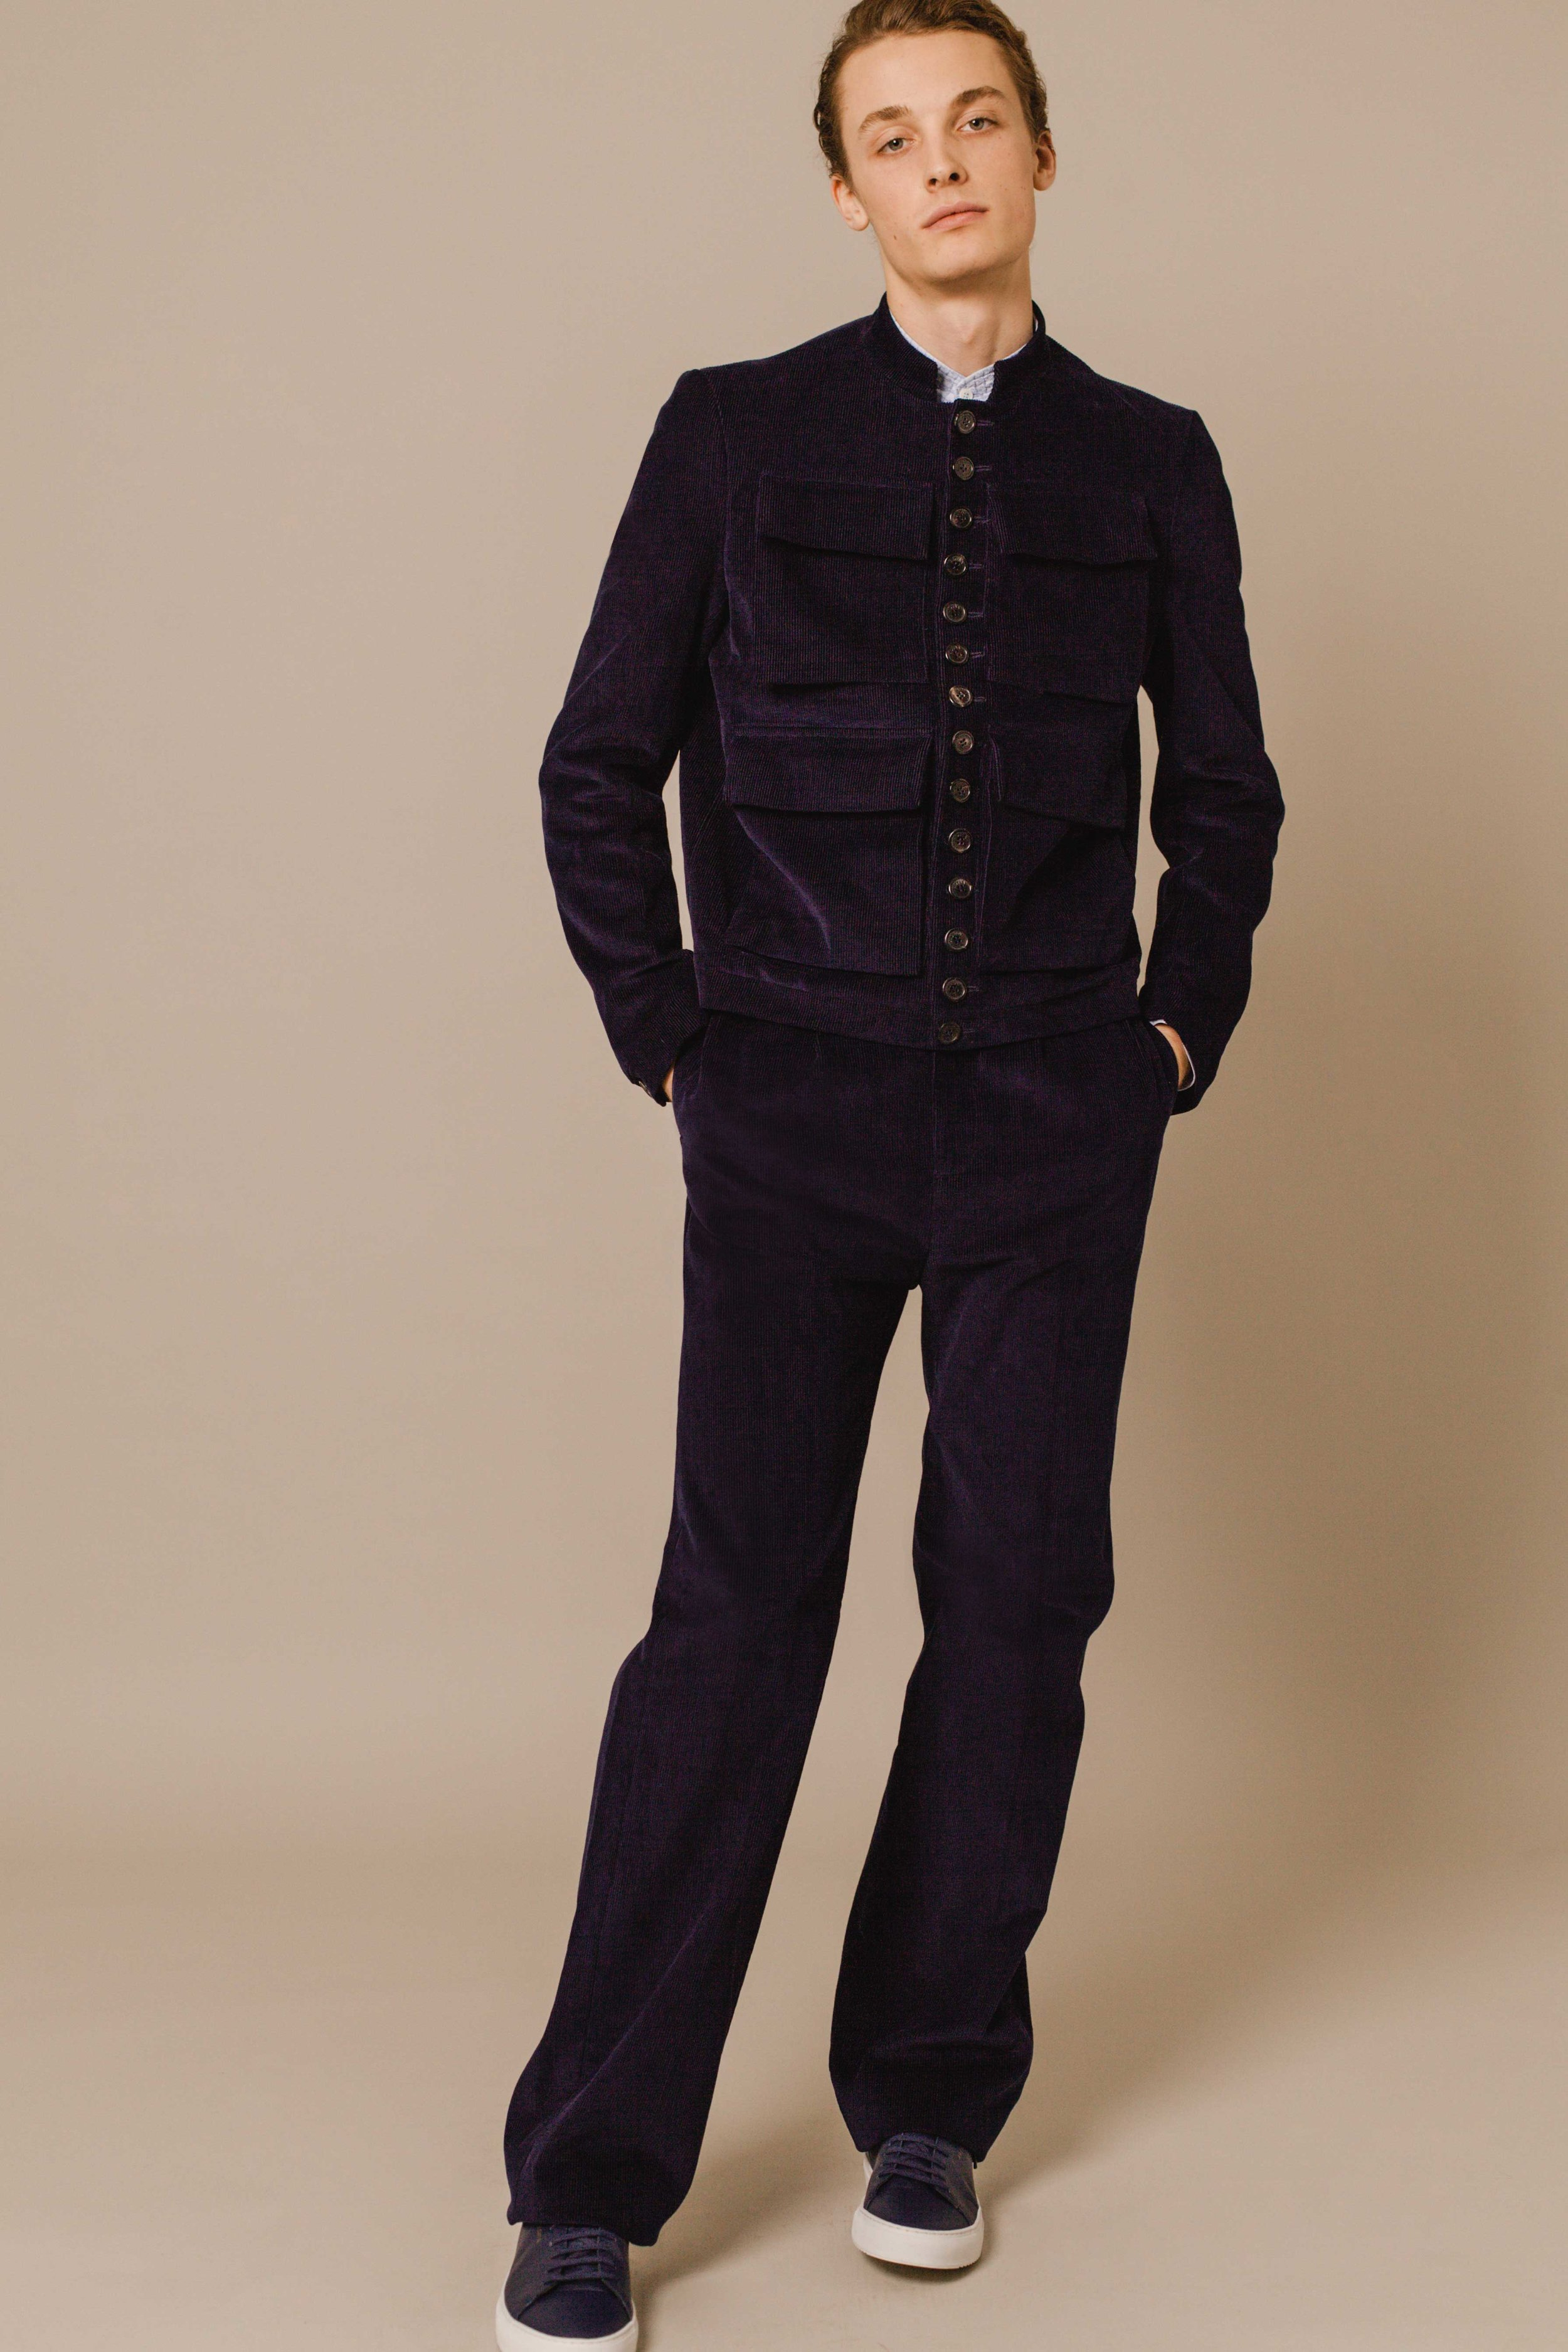 Aviator jacket navy Italian corduroy High waist trousers navy Italian corduroy Hand made in London